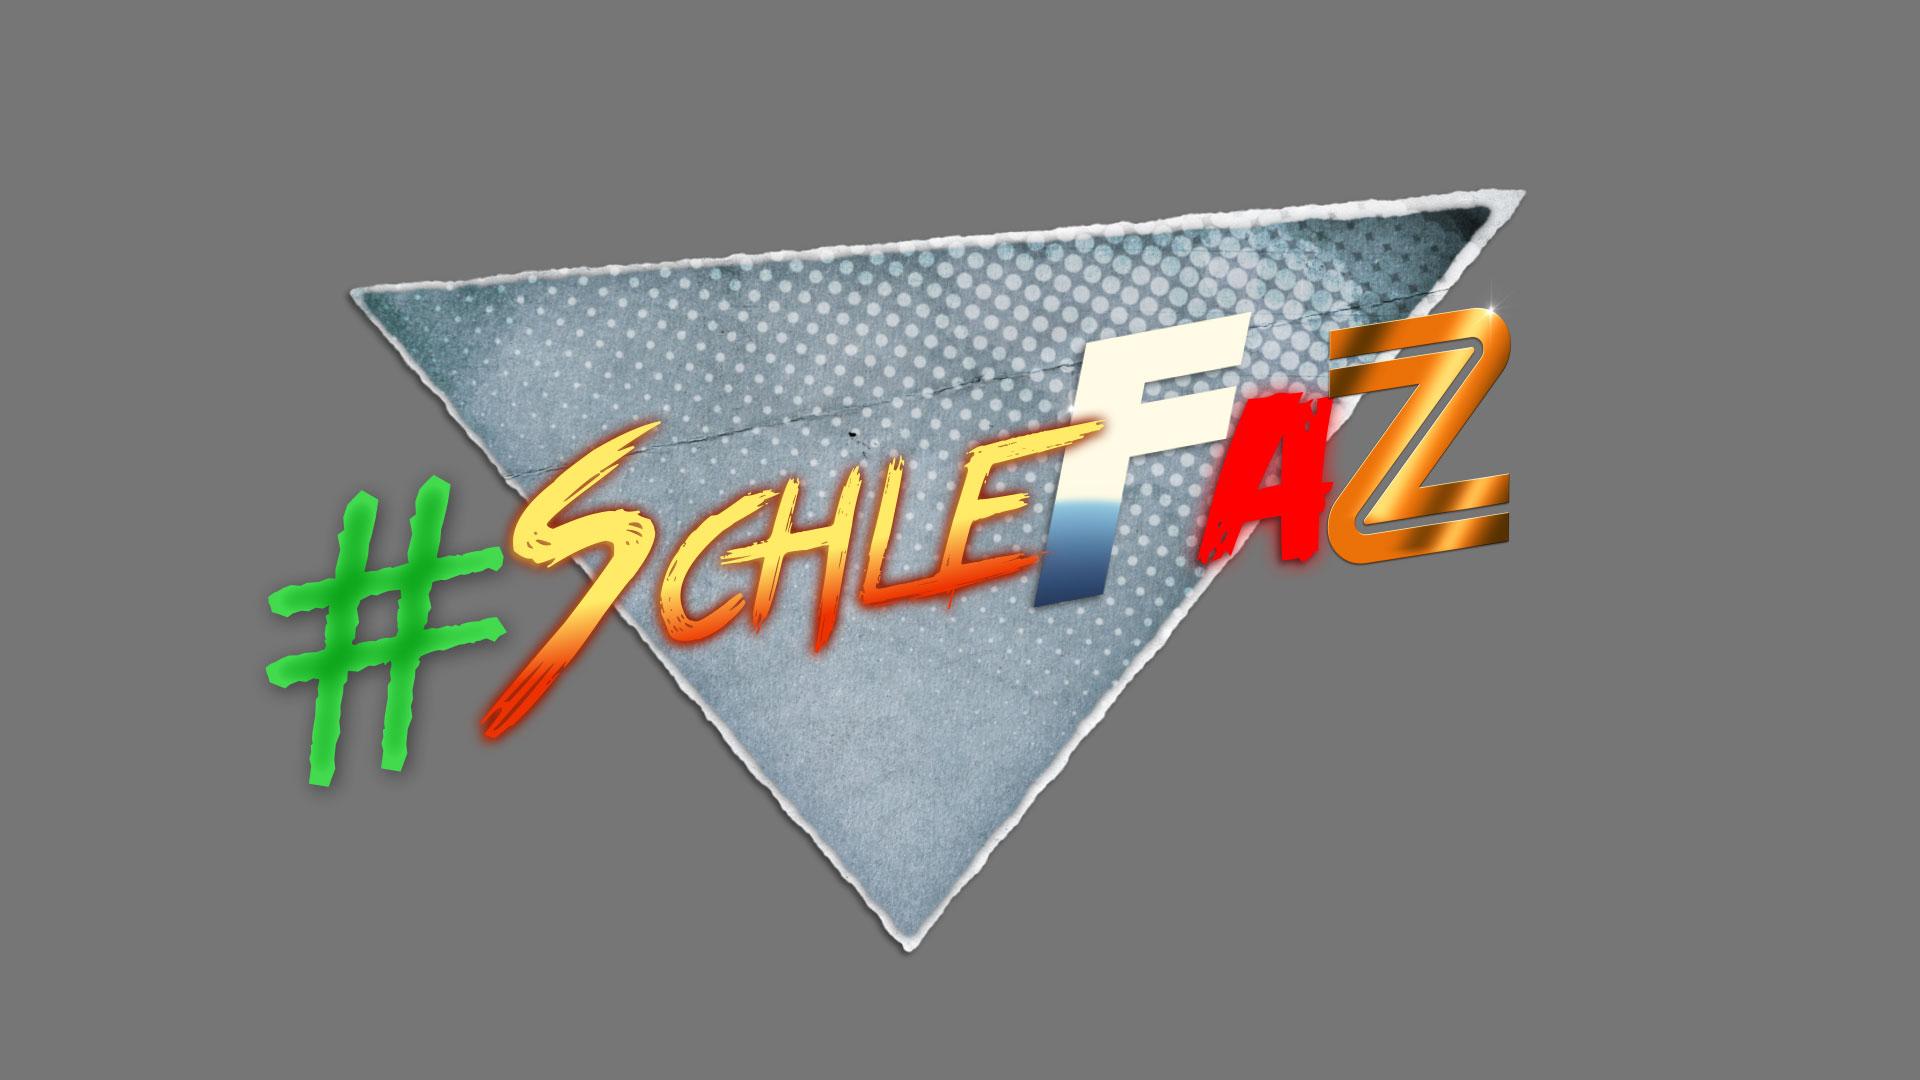 Sclefaz